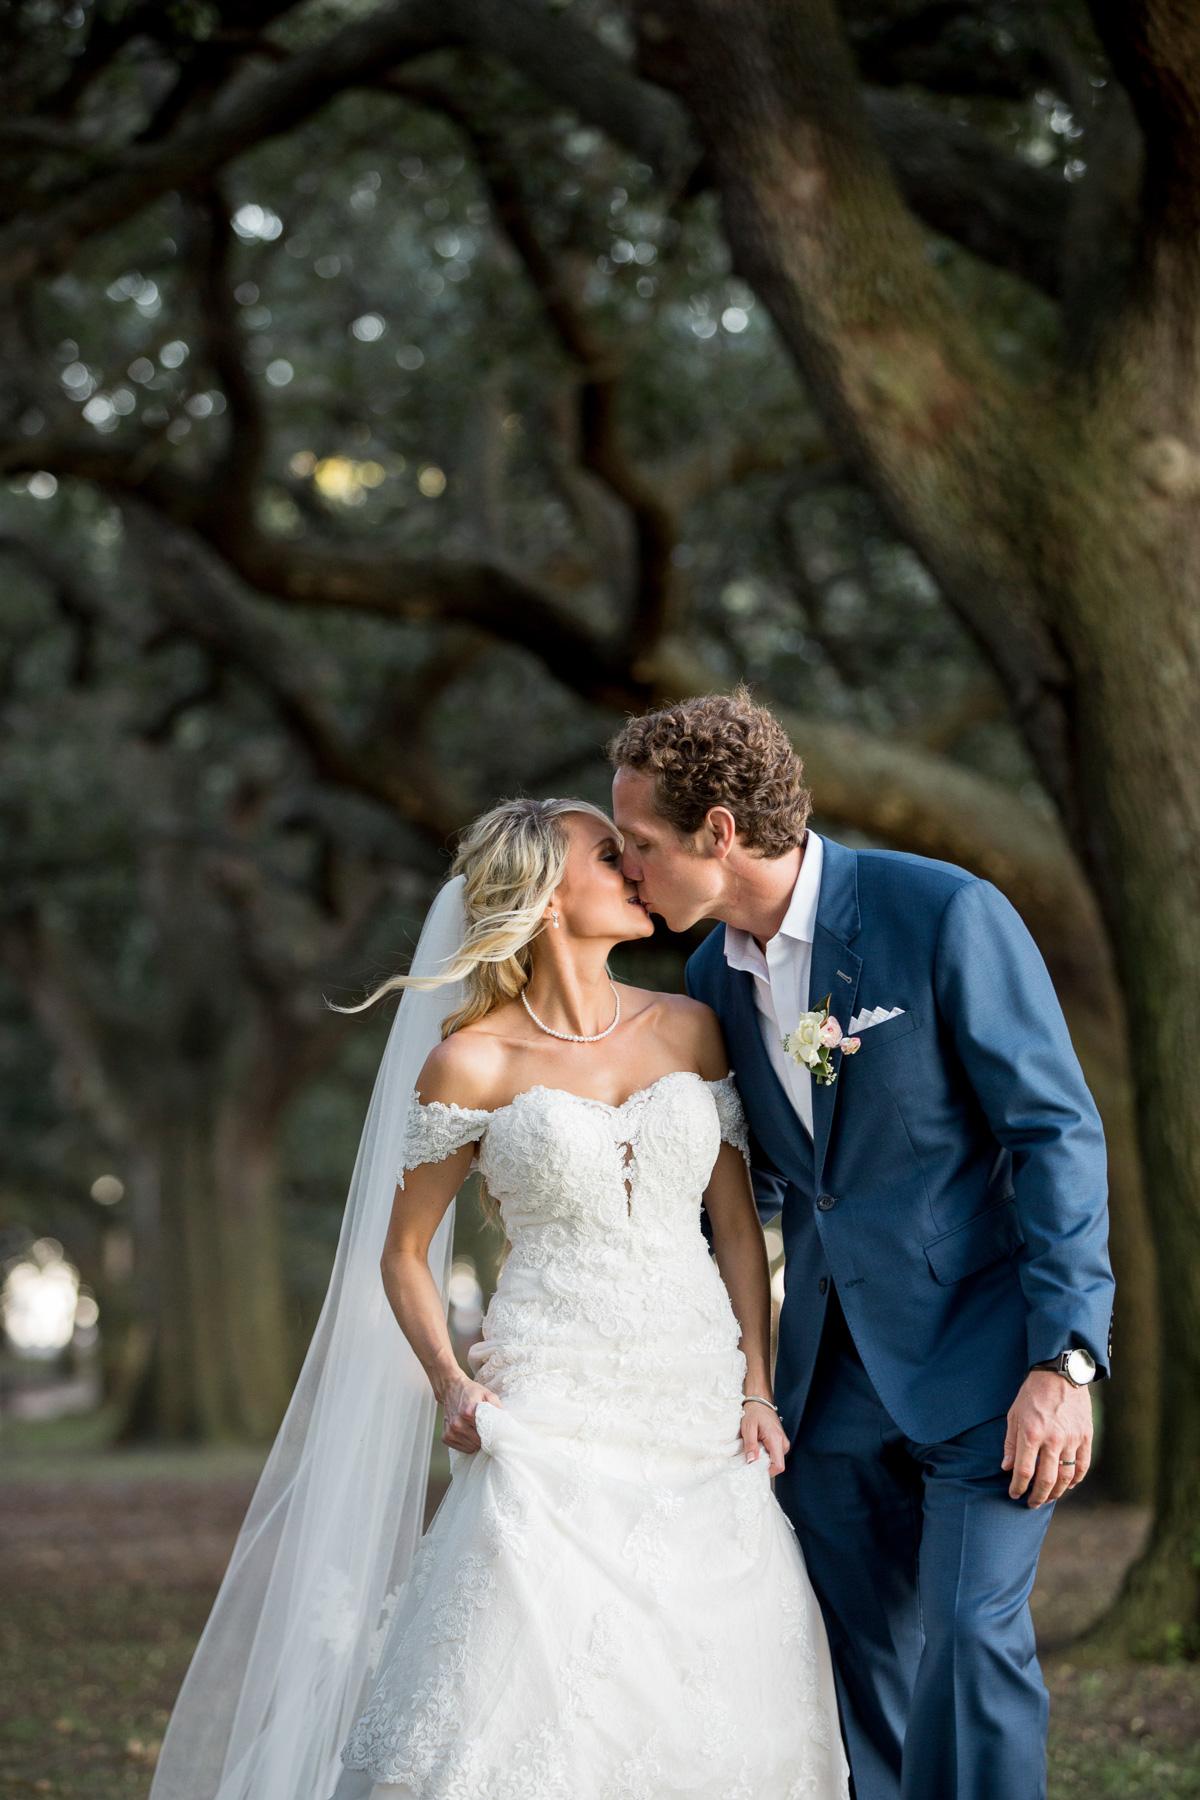 Charleston-best-wedding-photographer-SC-33.jpg